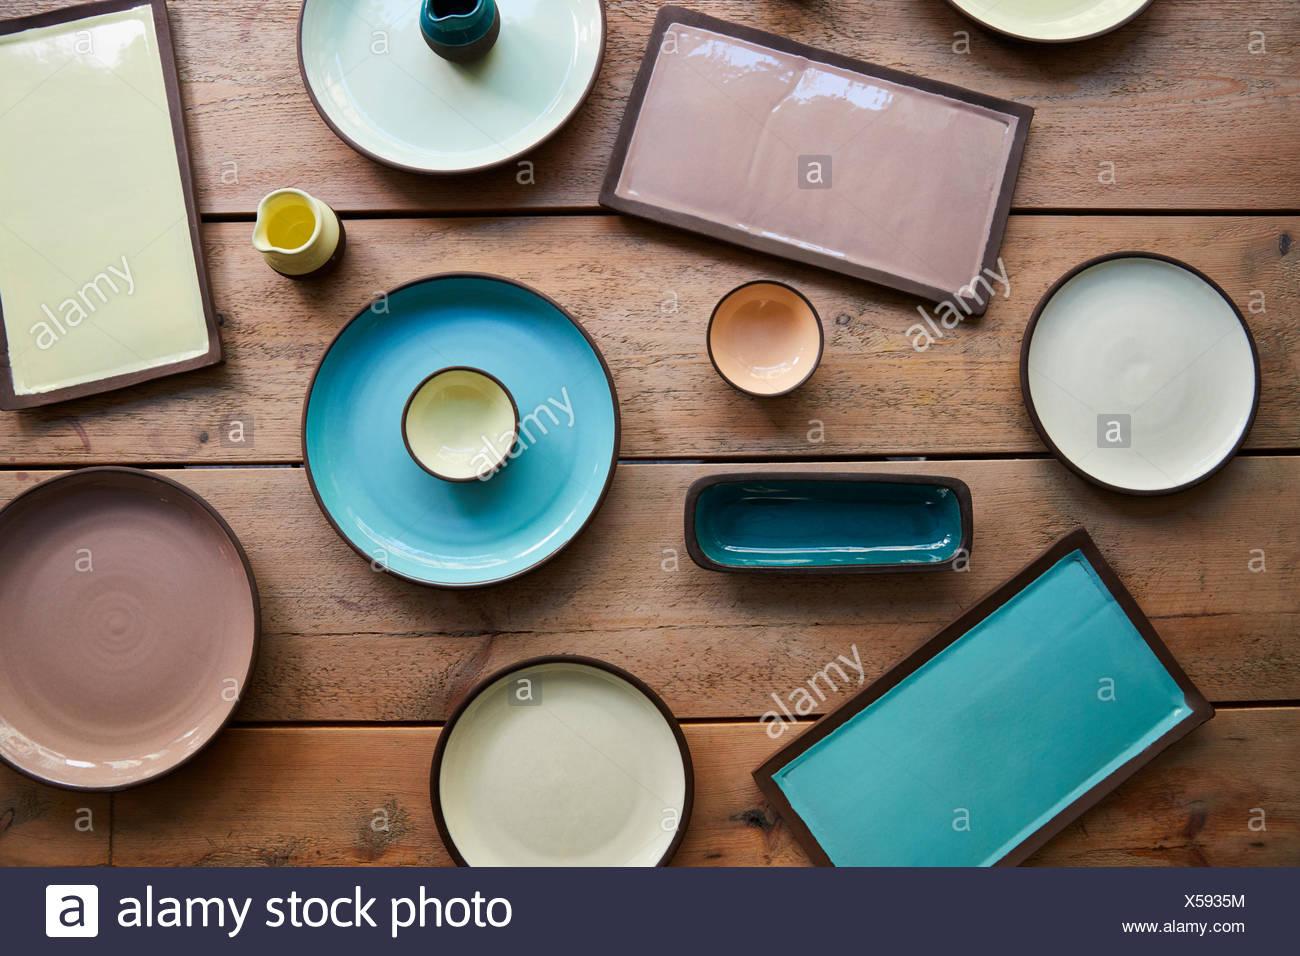 Handmade earthenware on a wooden table, overhead shot - Stock Image